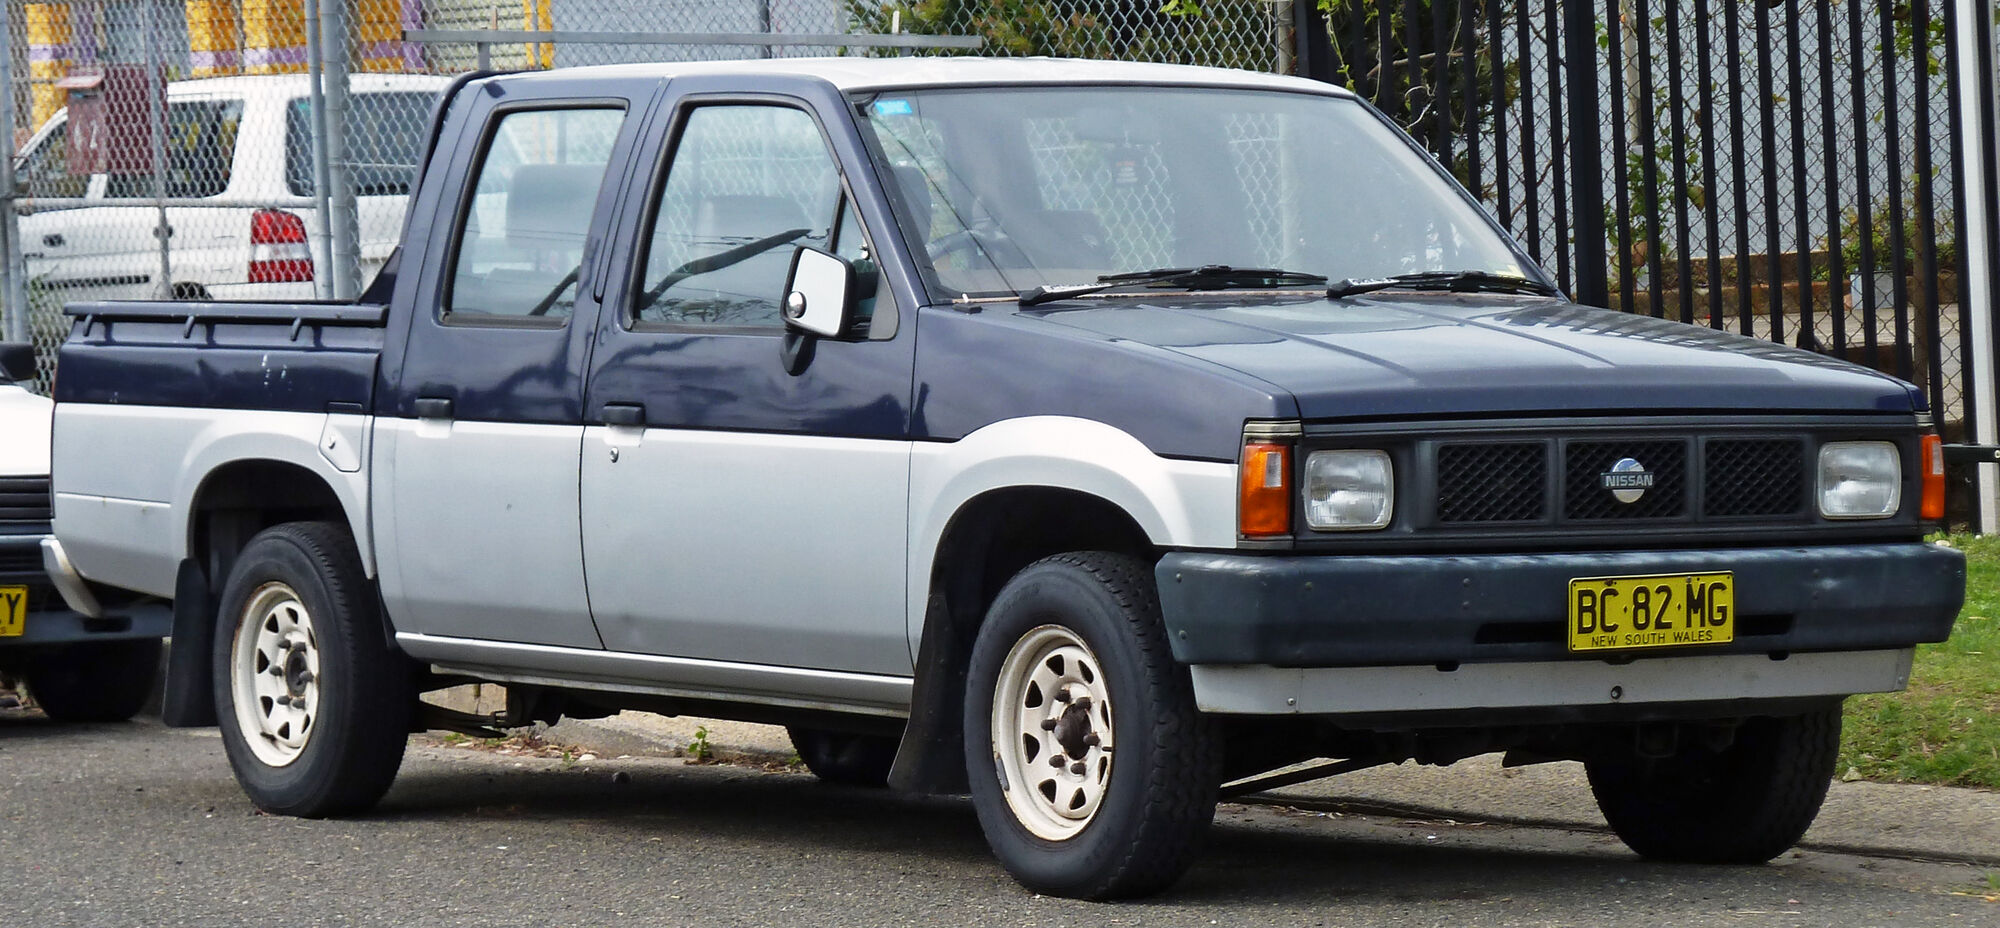 Nissan Hardbody Truck | Tractor & Construction Plant Wiki